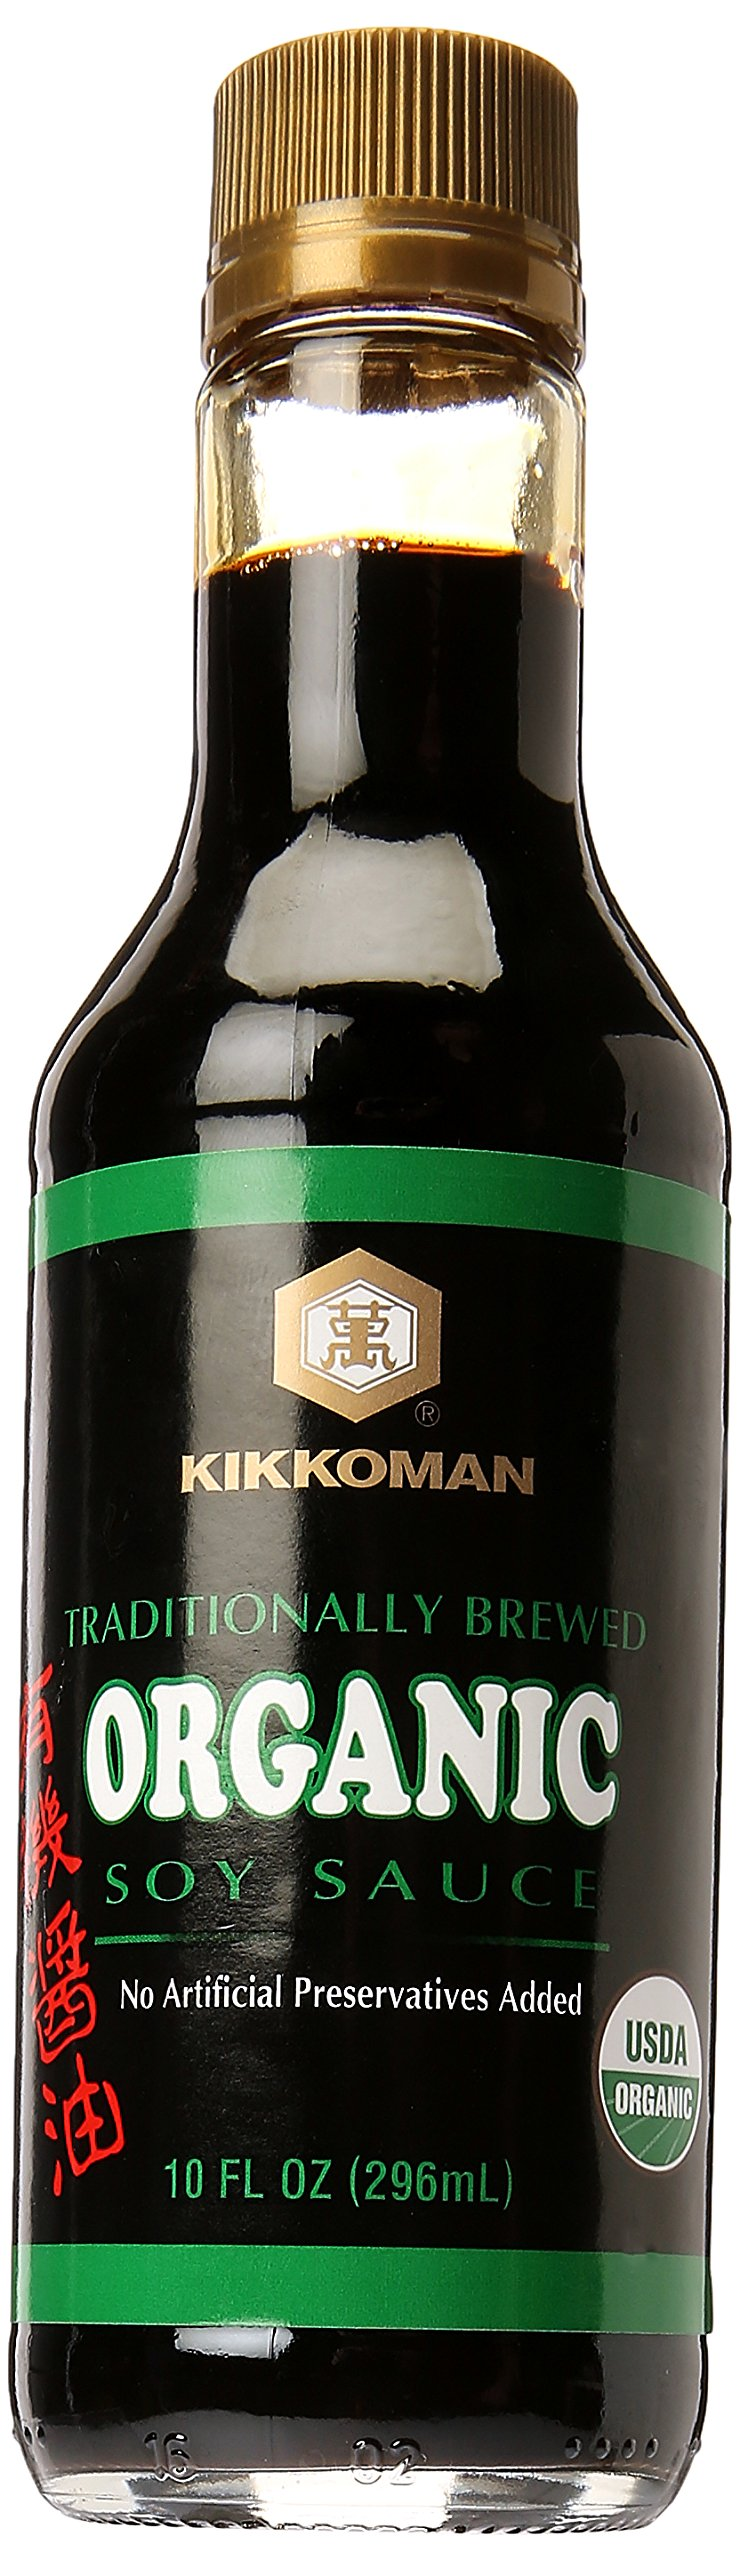 Kikkoman Organic Naturally Brewed Soy Sauce